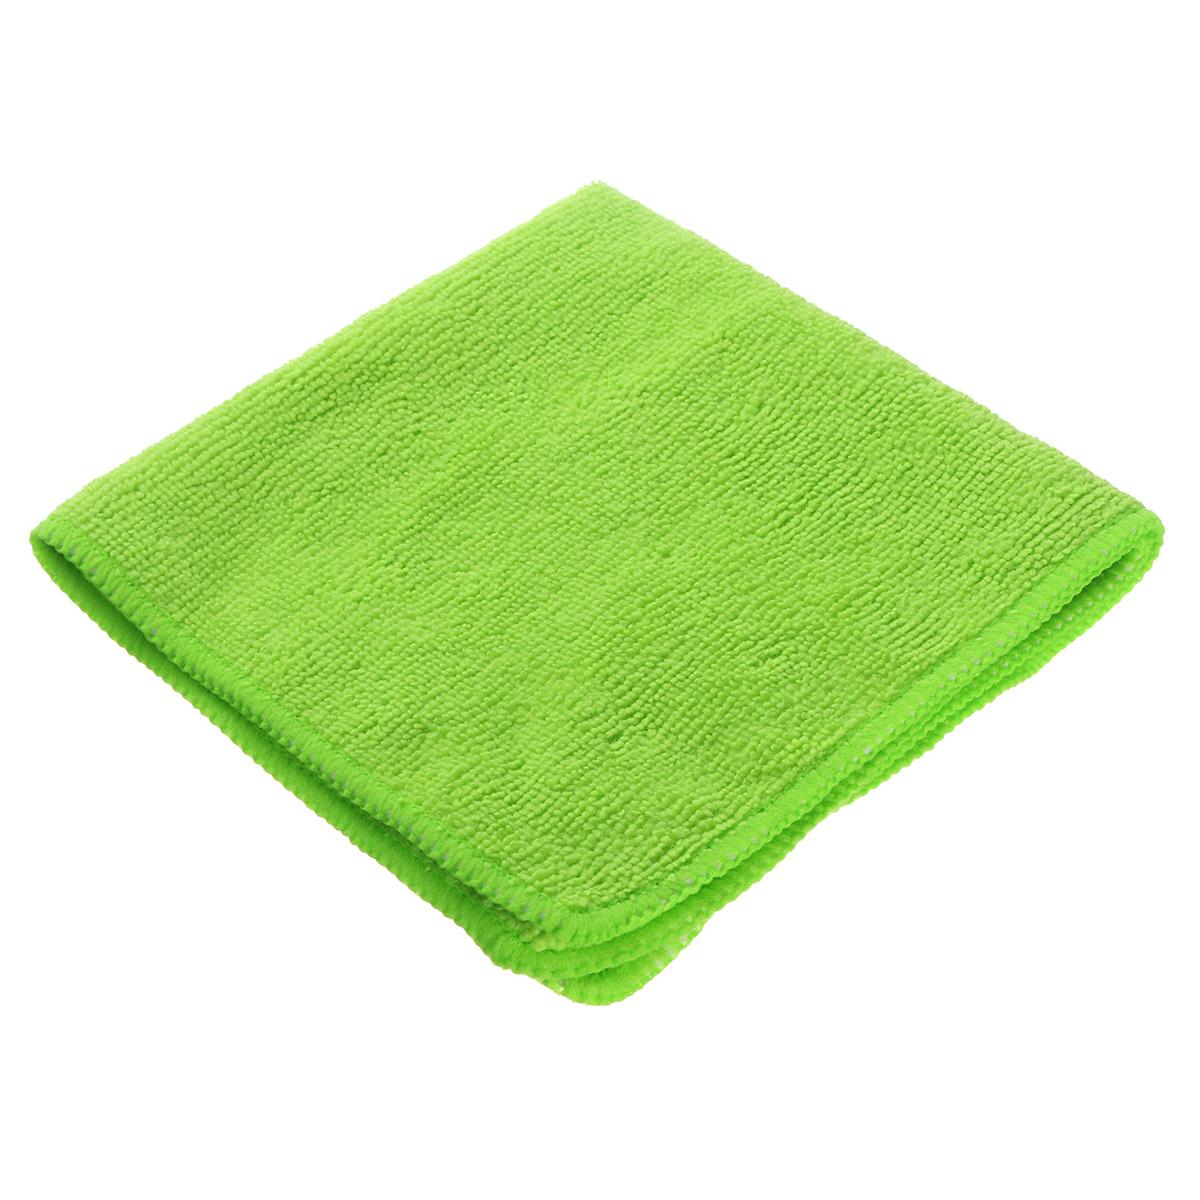 Car Cleaning Wipe Towel Fibre Towel Water Absorbent Multifunctional Car Towel